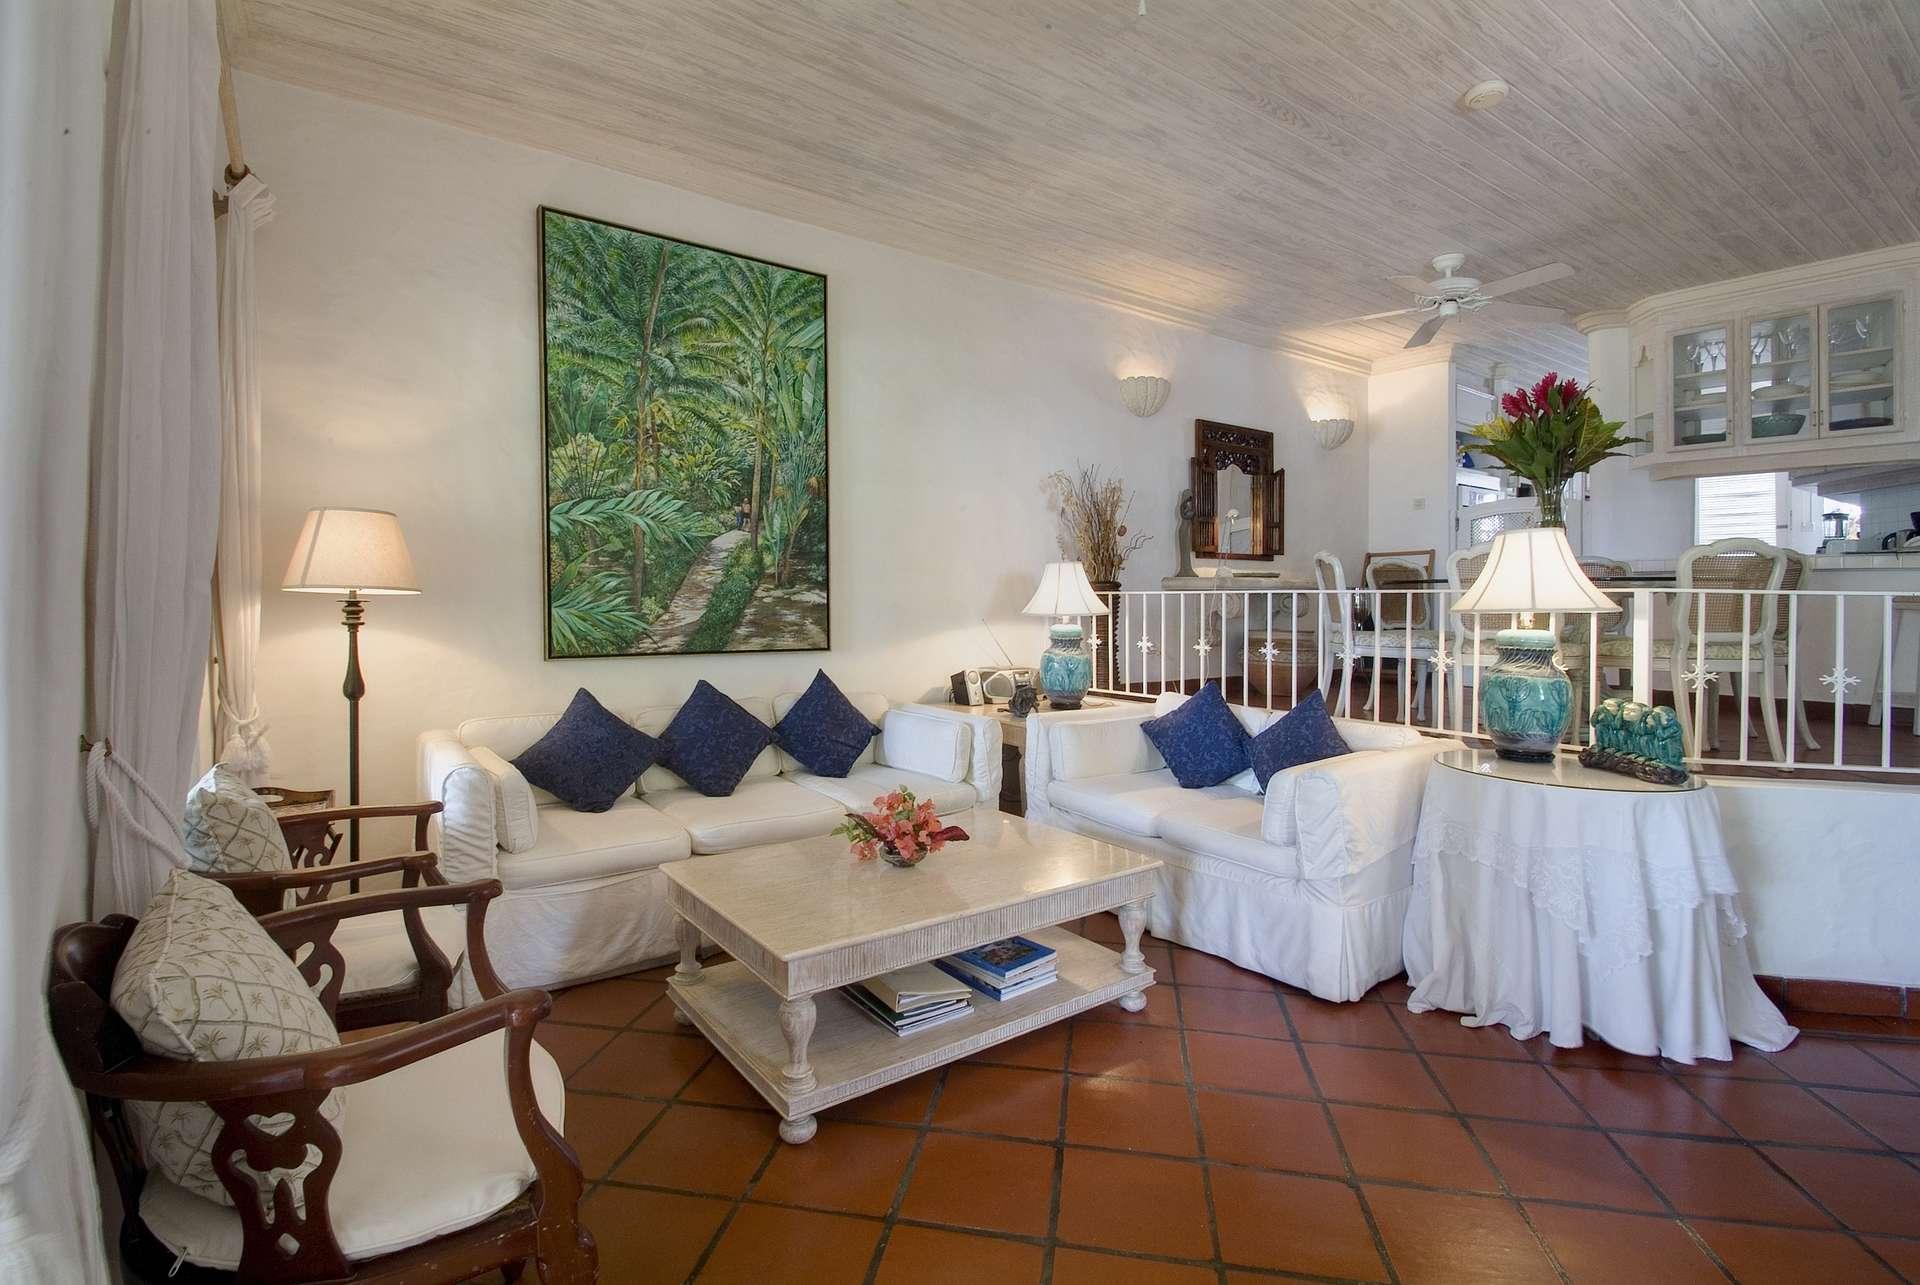 Luxury villa rentals caribbean - Barbados - St peter - Gibbes - Emerald Beach 2 | Allamanda - Image 1/7